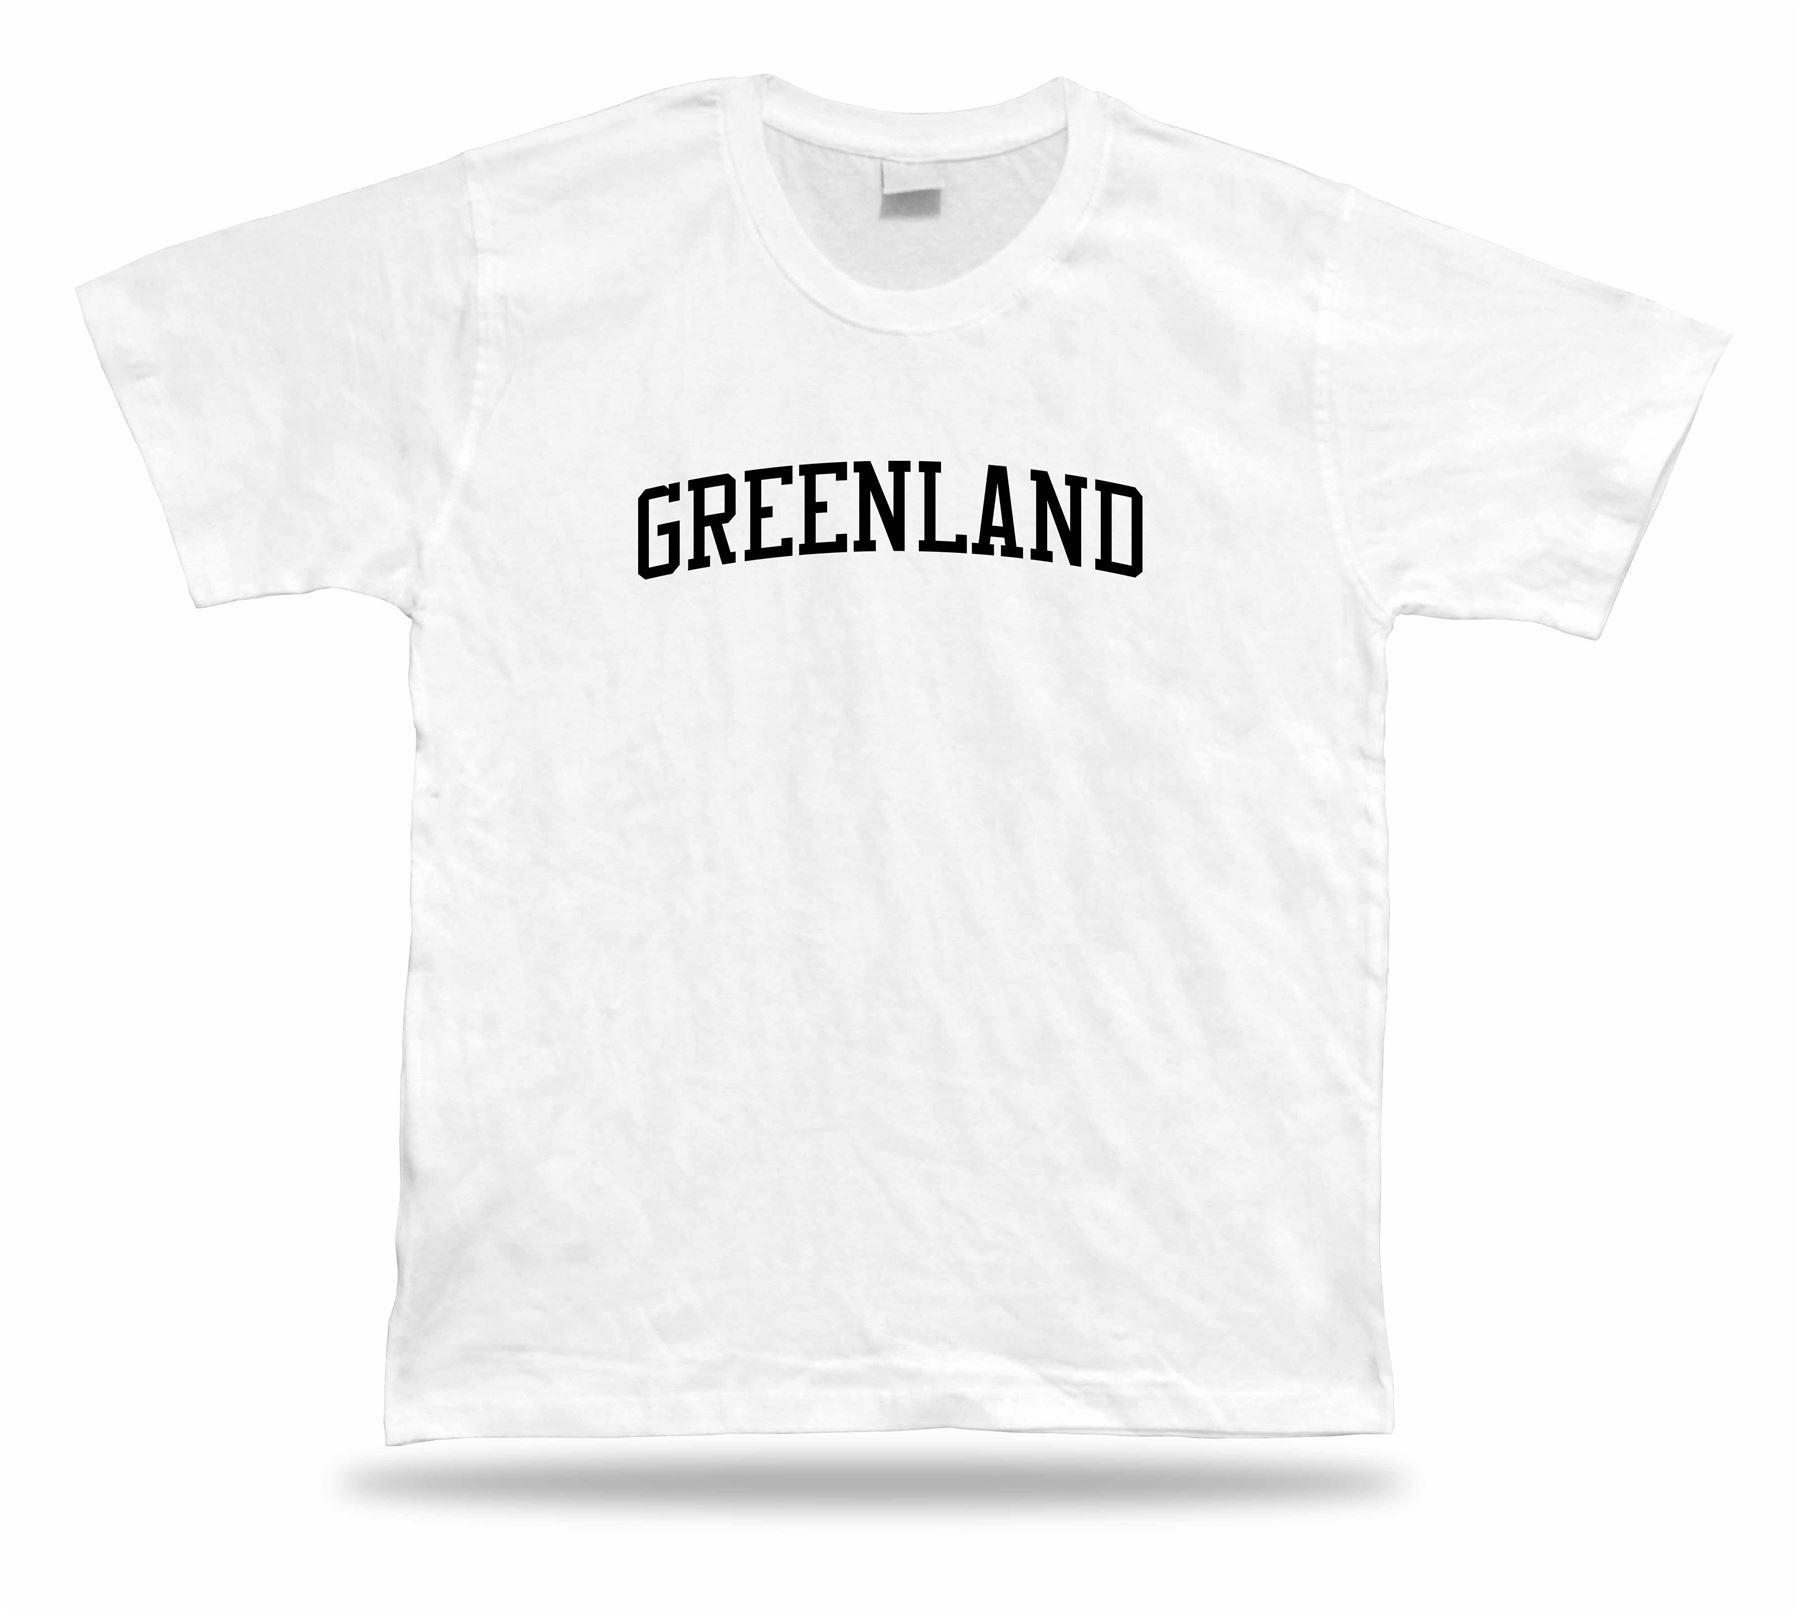 T-shirt Stylish Greenland Tee Gift Idea Modern Fashion Sport North ... fbd69562d